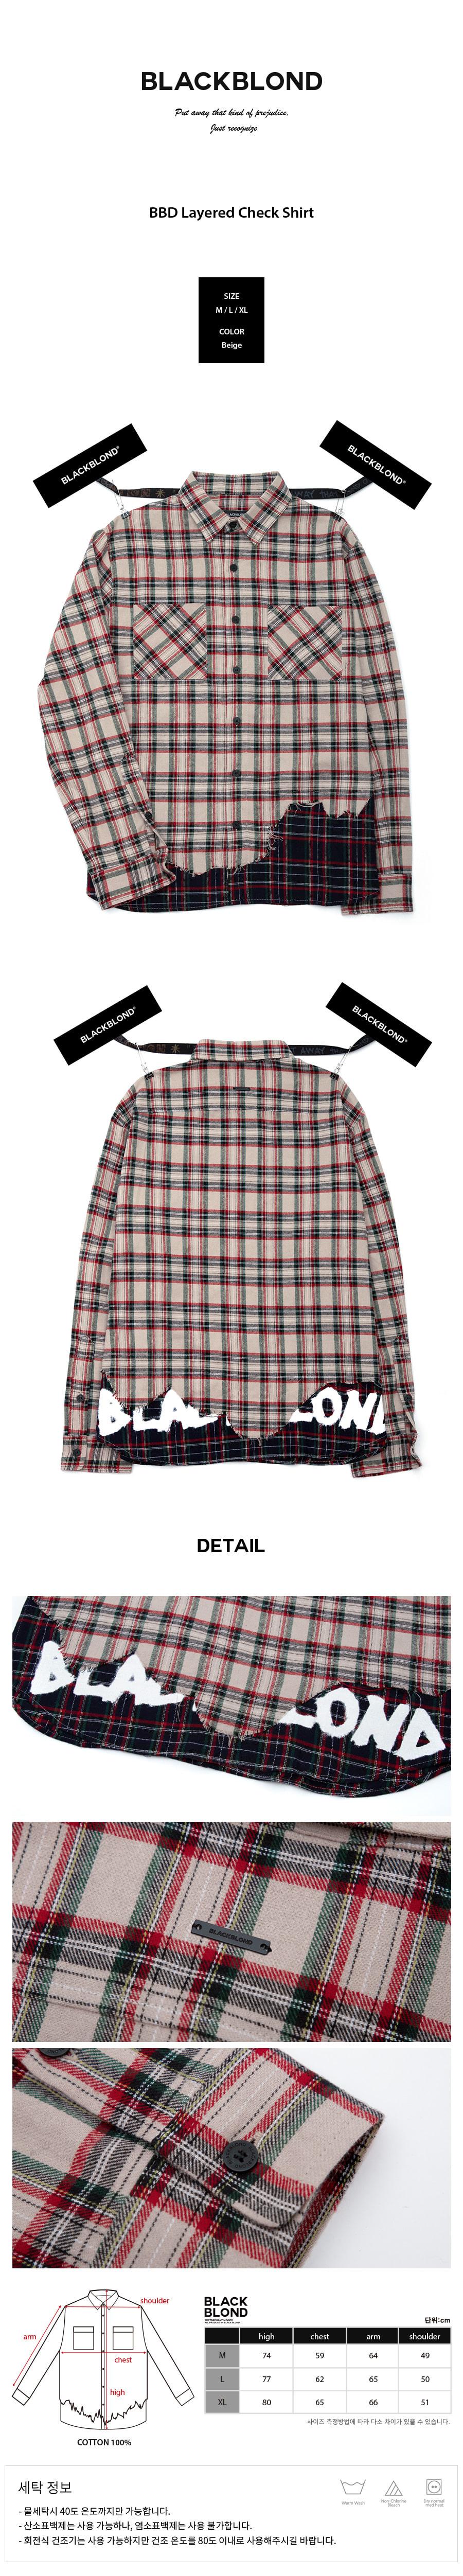 BBD-Layered-Check-Shirt-%28Beige%29.jpg